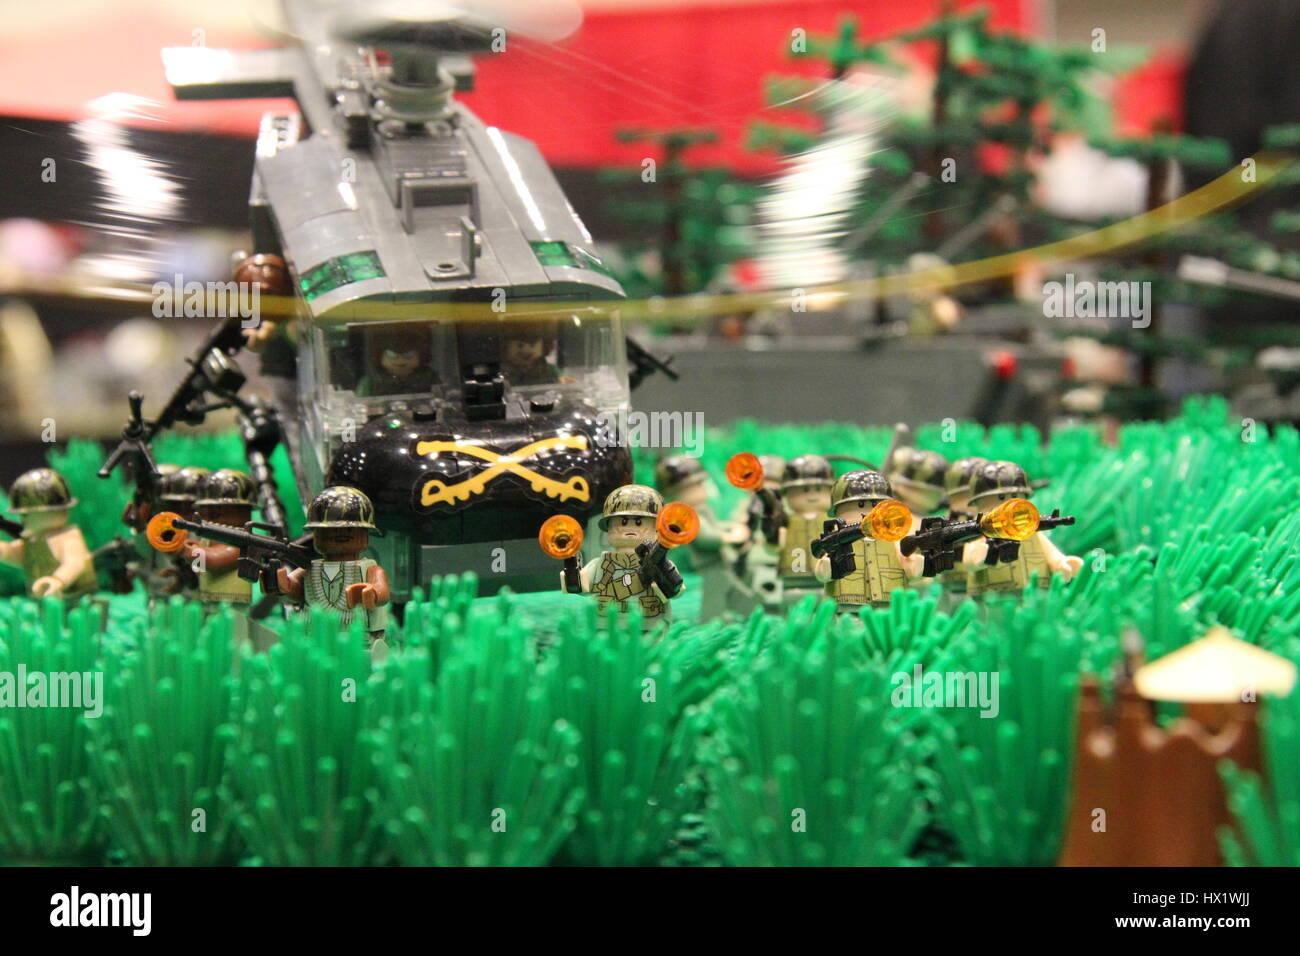 Lego Mini figures at Lego Convention - Stock Image